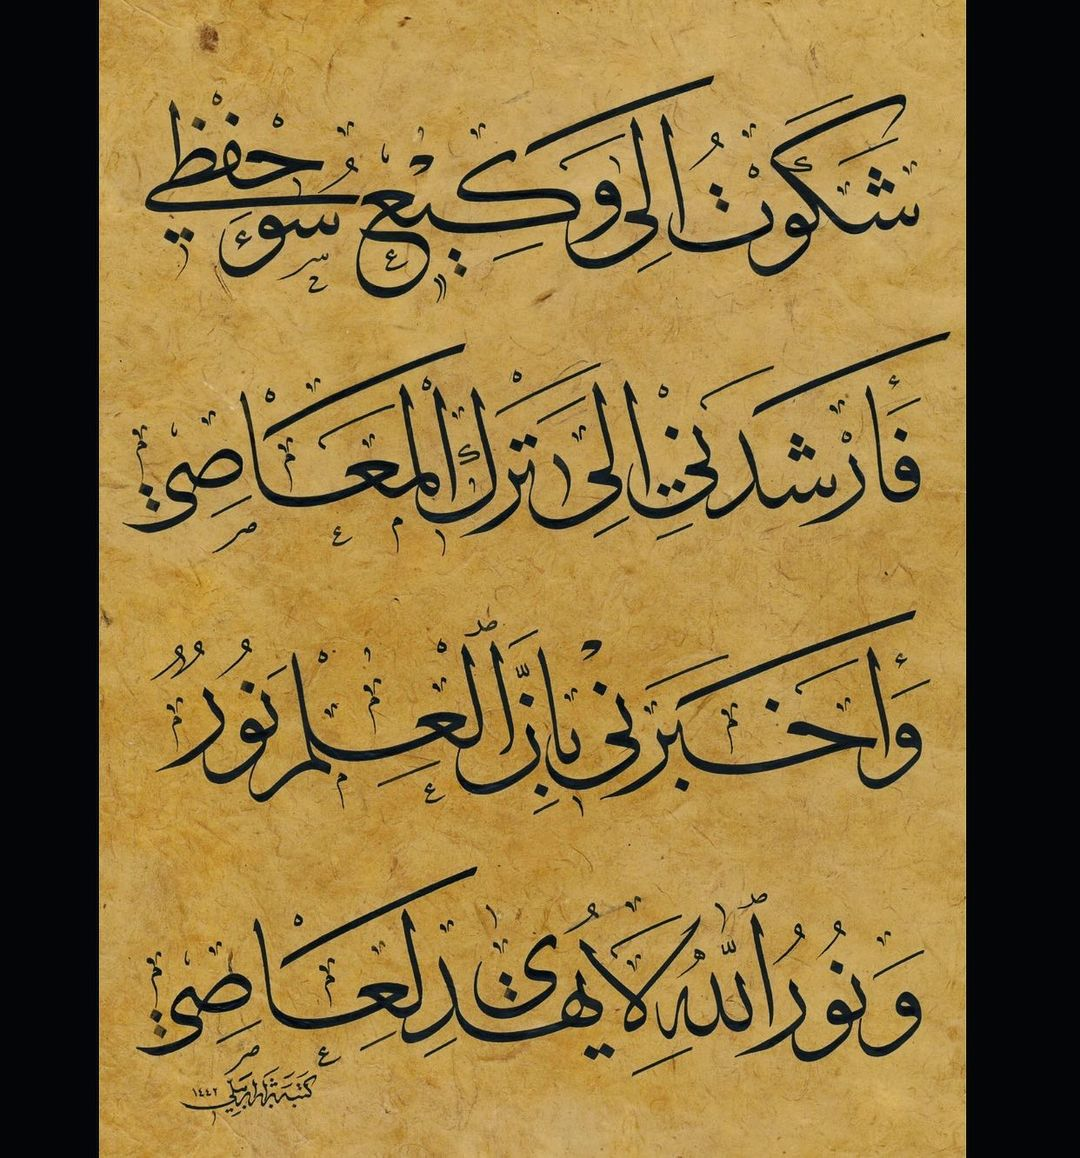 Professional Calligrapher Bijar Arbilly Calligraphy  طابت اوقاتكم اعزائي ومبارك عليكم عام هجري جديد … الامام الشافعي رحمة الله عليه #… 732